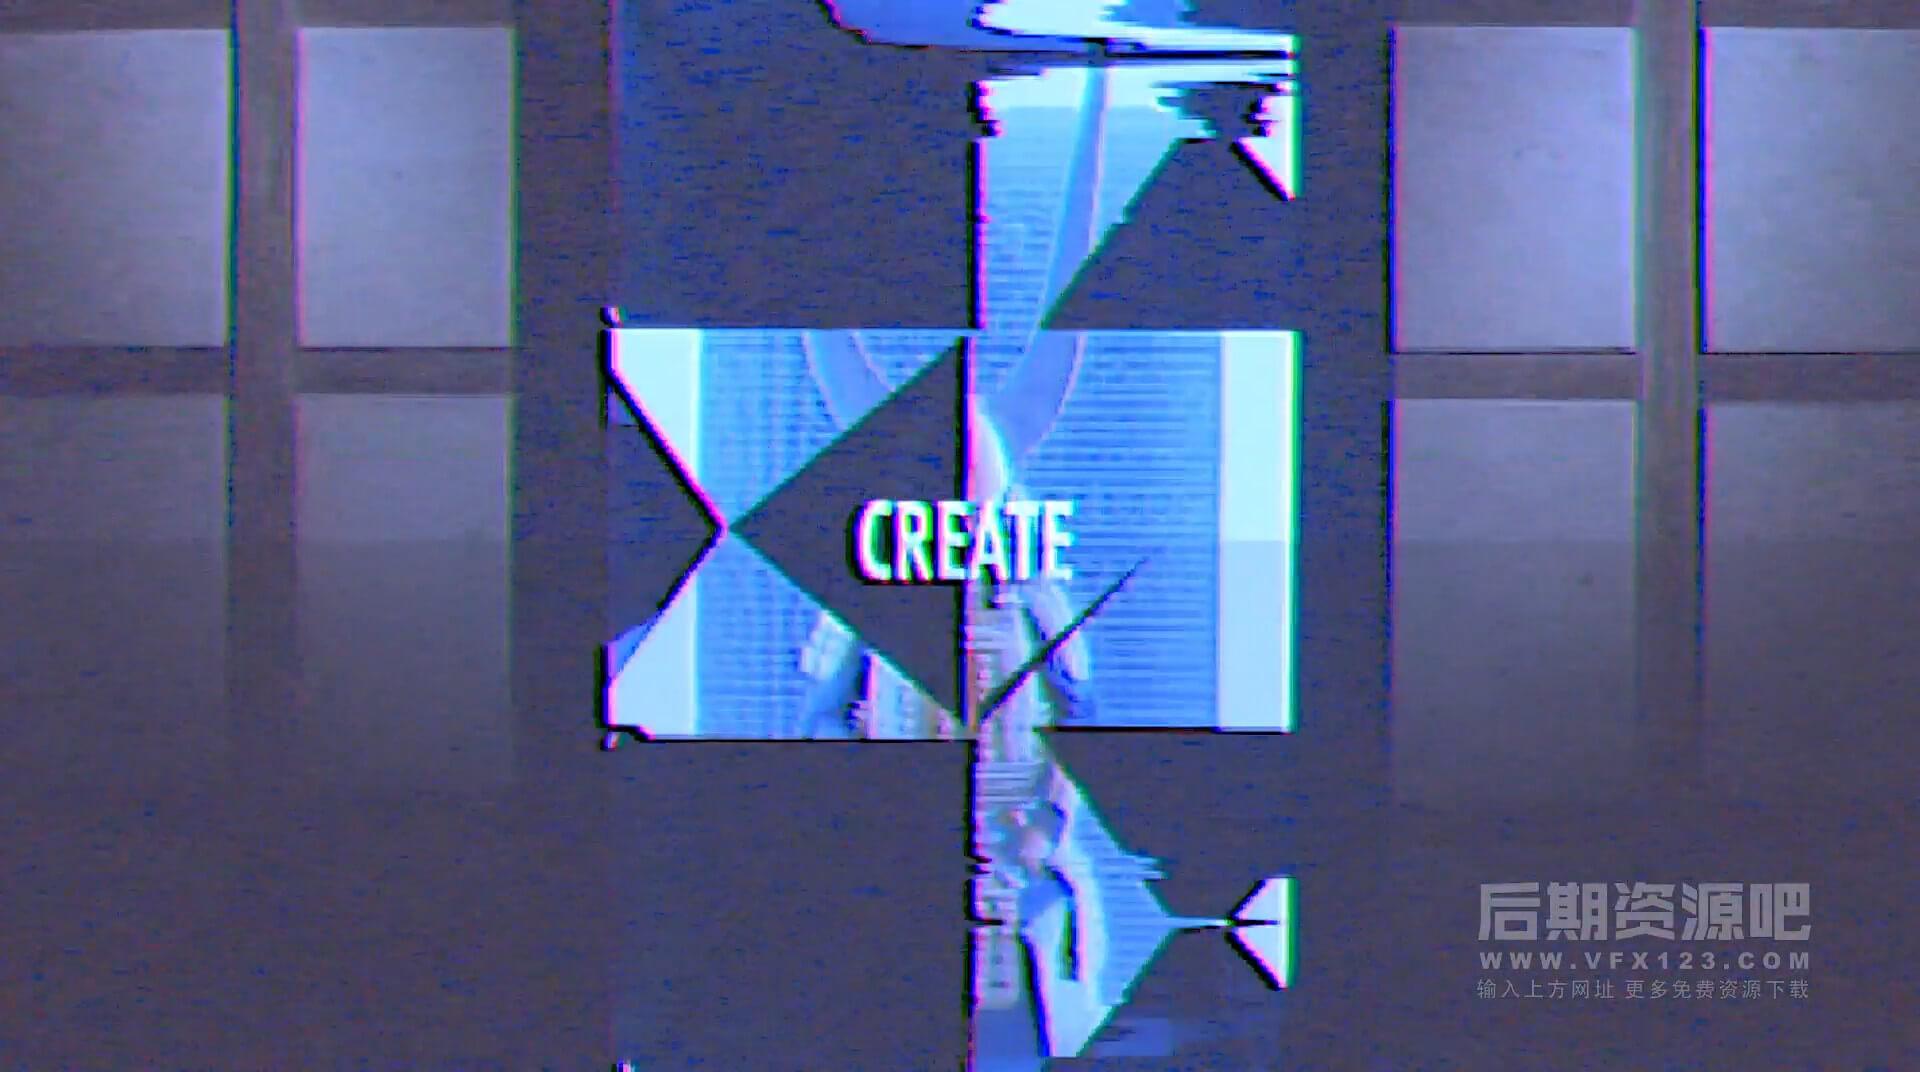 Fcpx主题模板 劲爆活力故障干扰抖音色彩分离效果片头 Energetic Opener